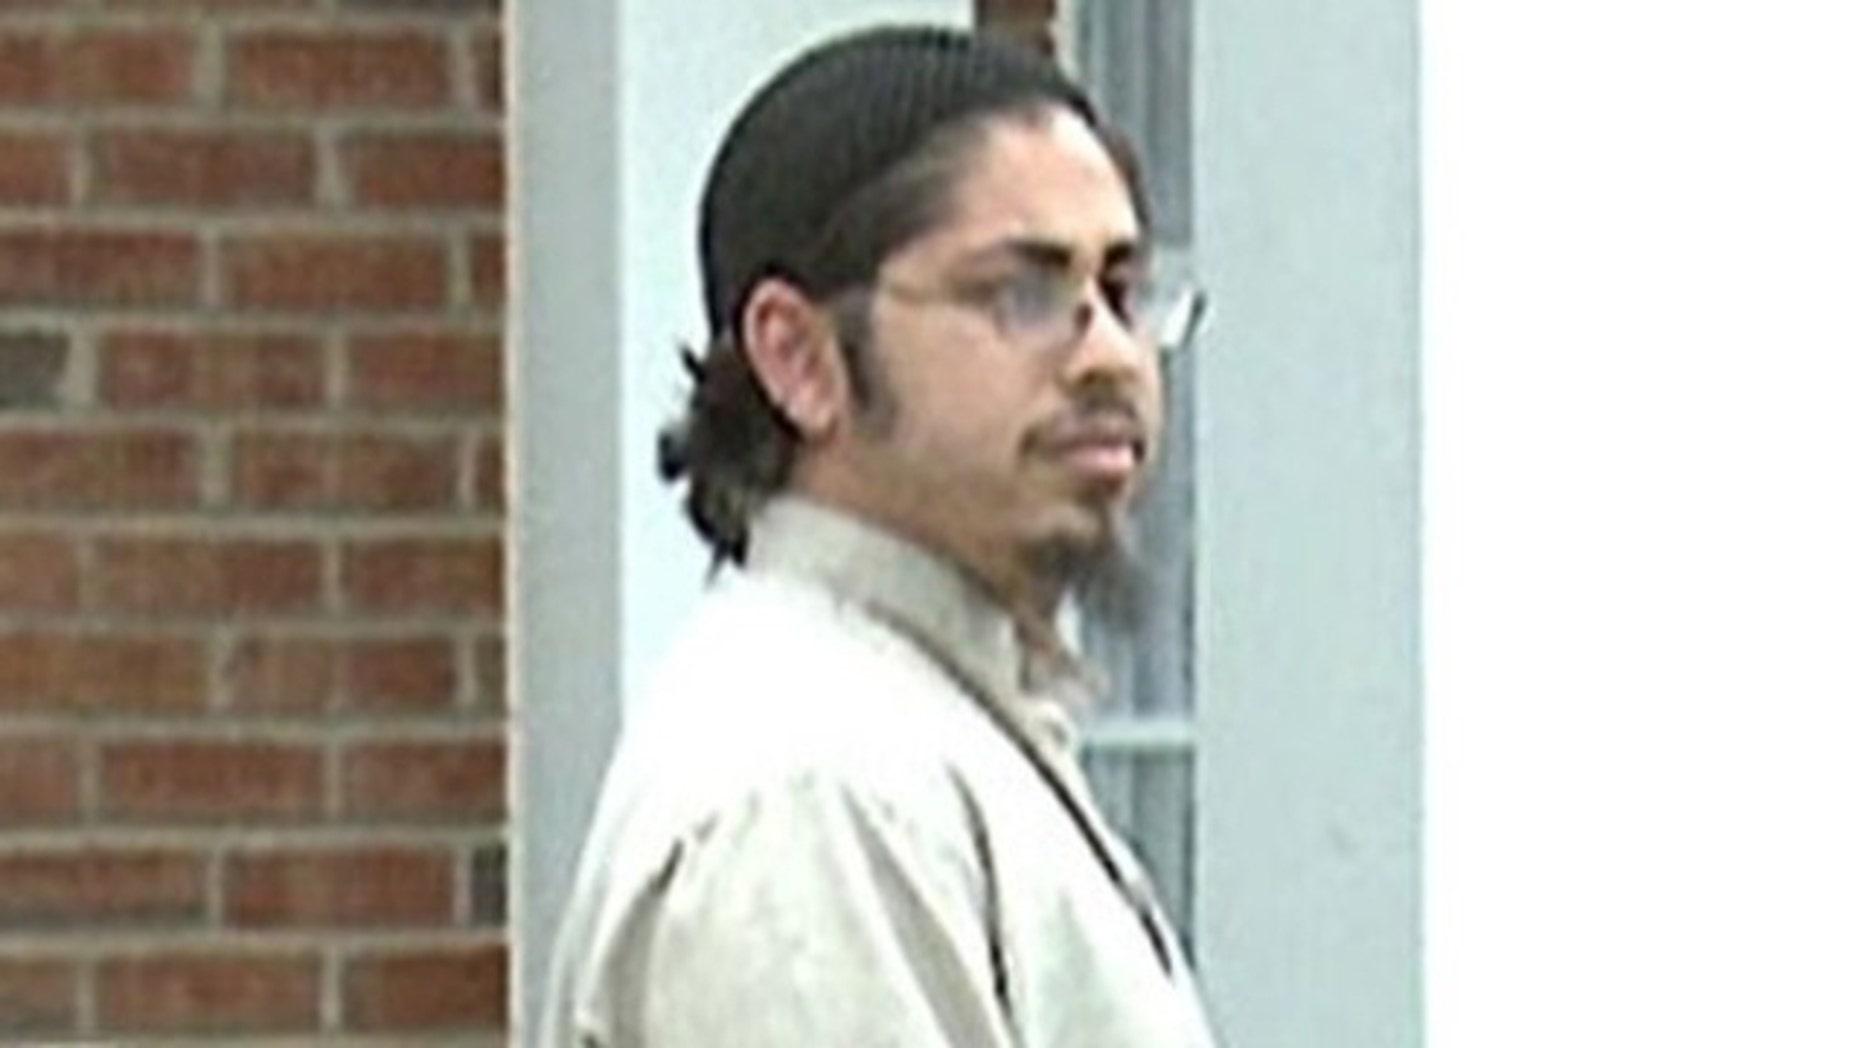 This 2008 image shows Samir Khan outside his parents' Charlotte, N.C., home.